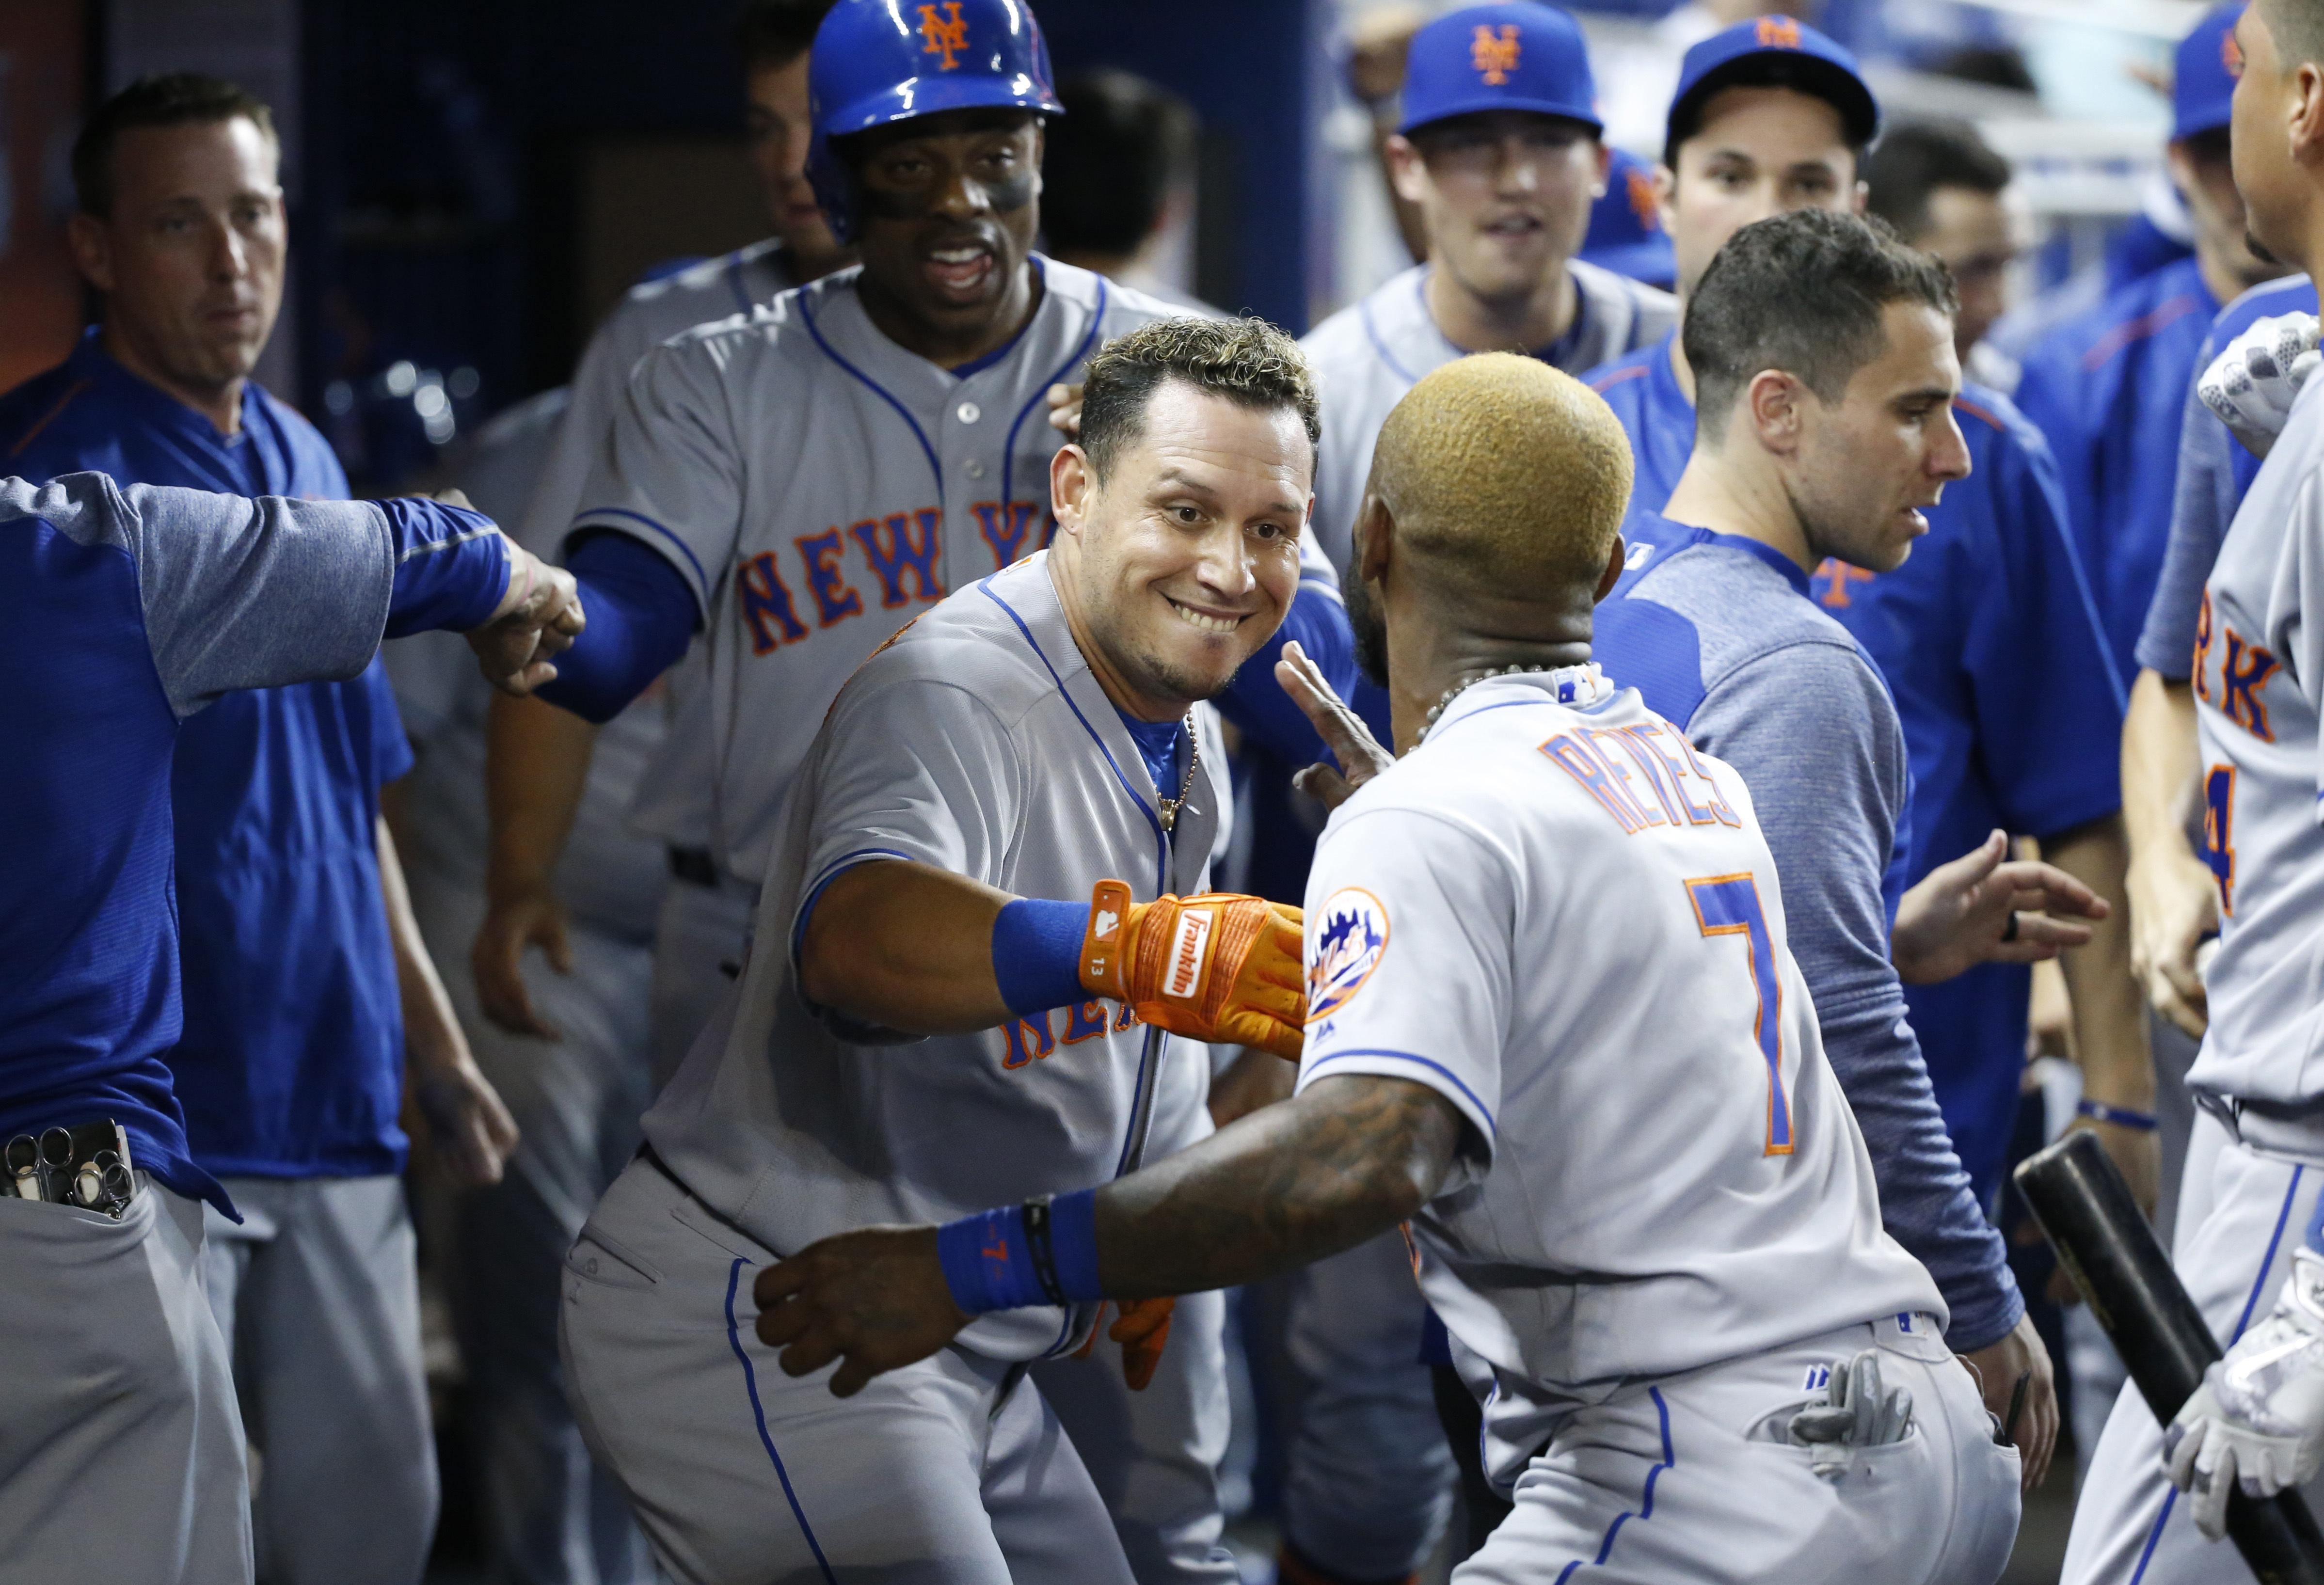 Mets_marlins_baseball_43550